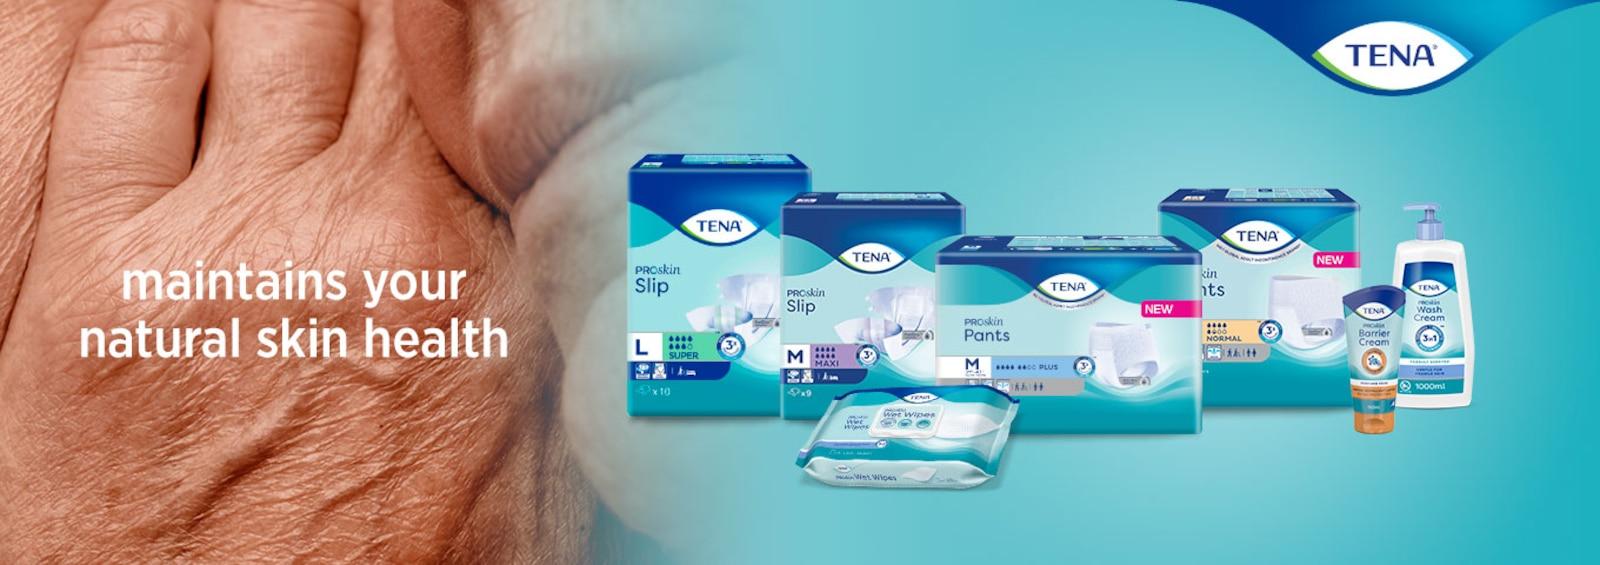 TENA Proskin product range